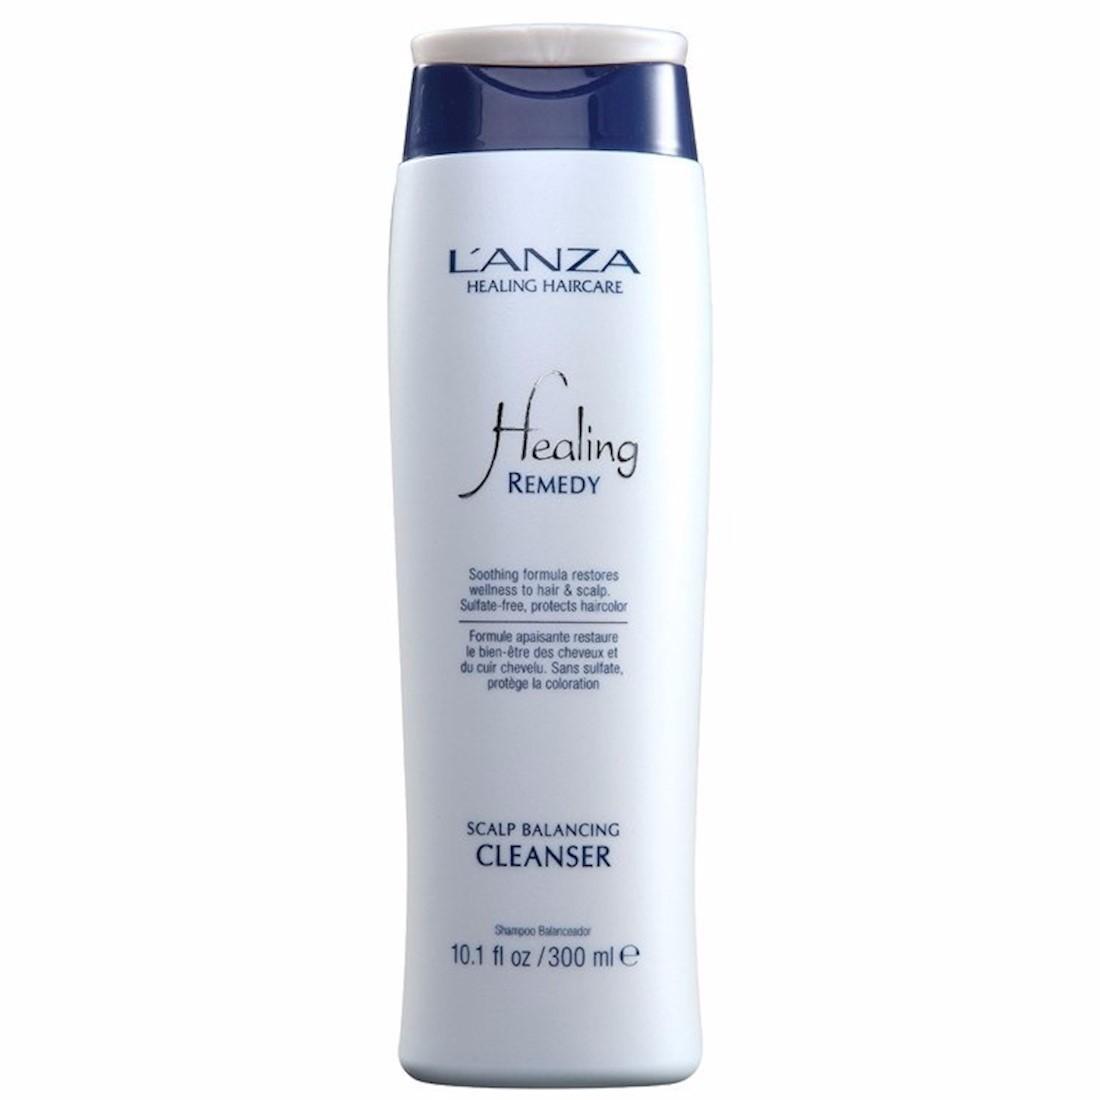 Lanza Remedy Scalp Balancing Cleanser 300ml